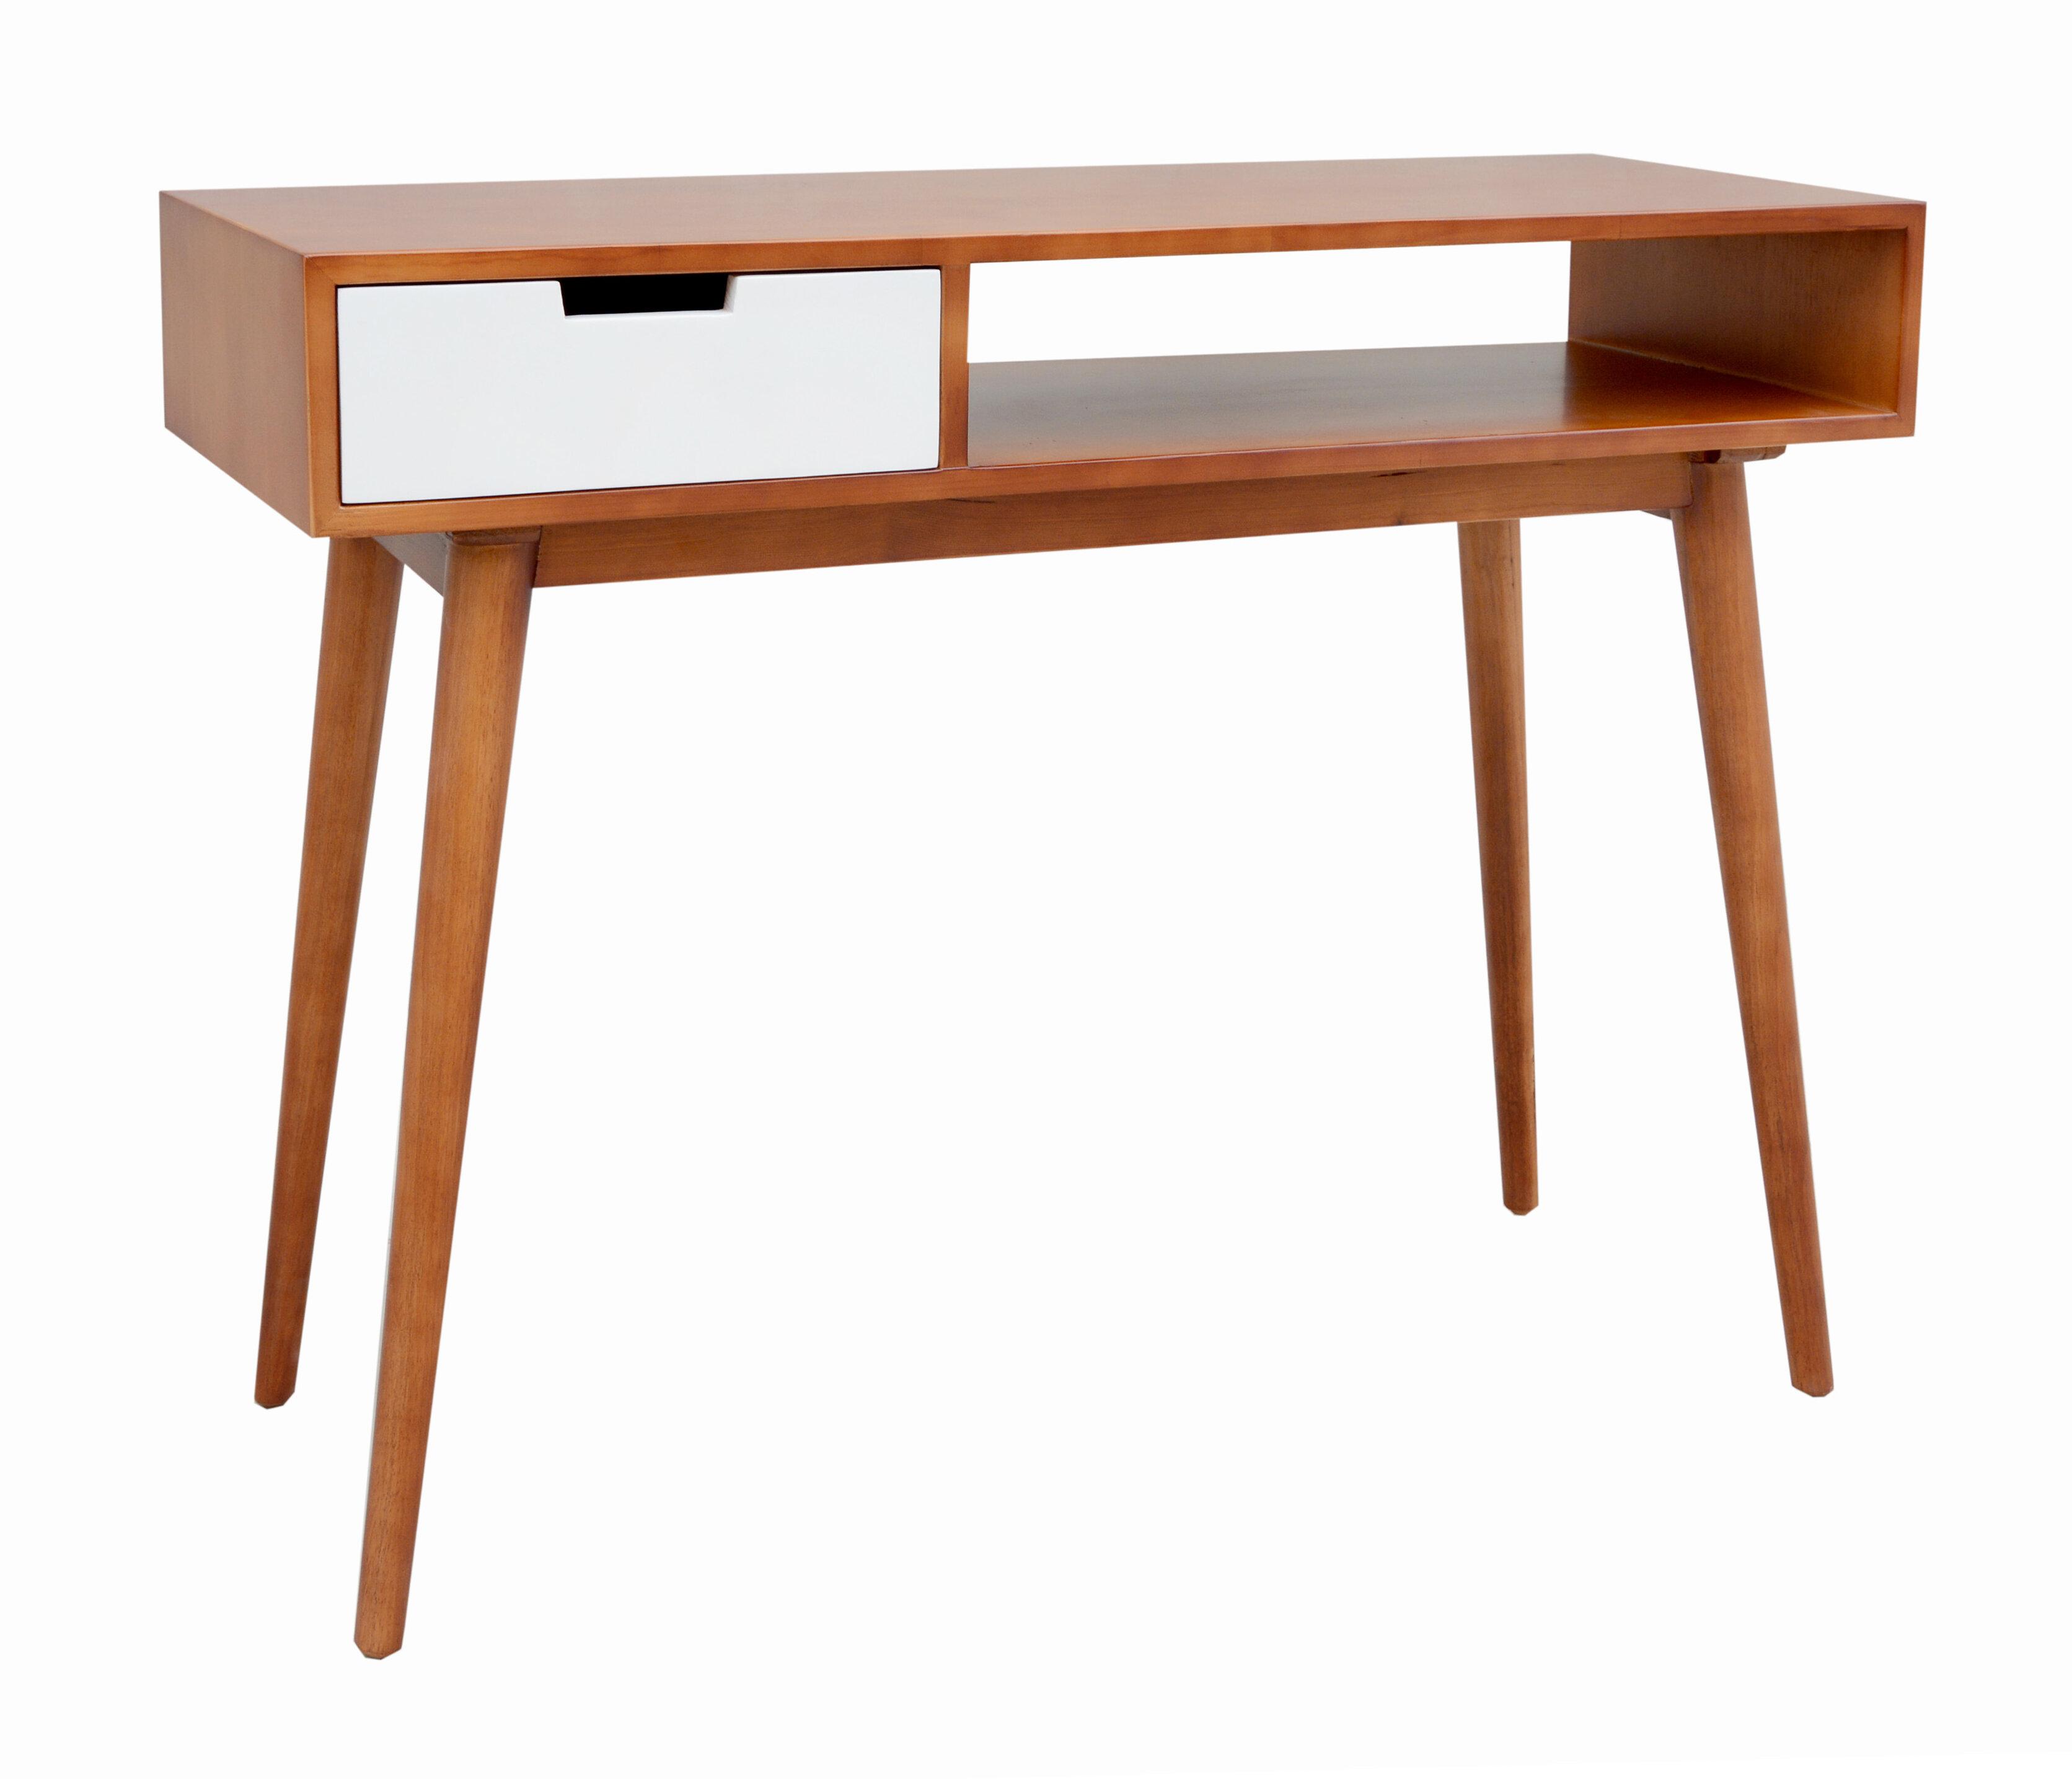 George Oliver Ripton Mid Century Modern Coffee Table: Mid Century Sofa Table Colored Mid Century Credenza Modern